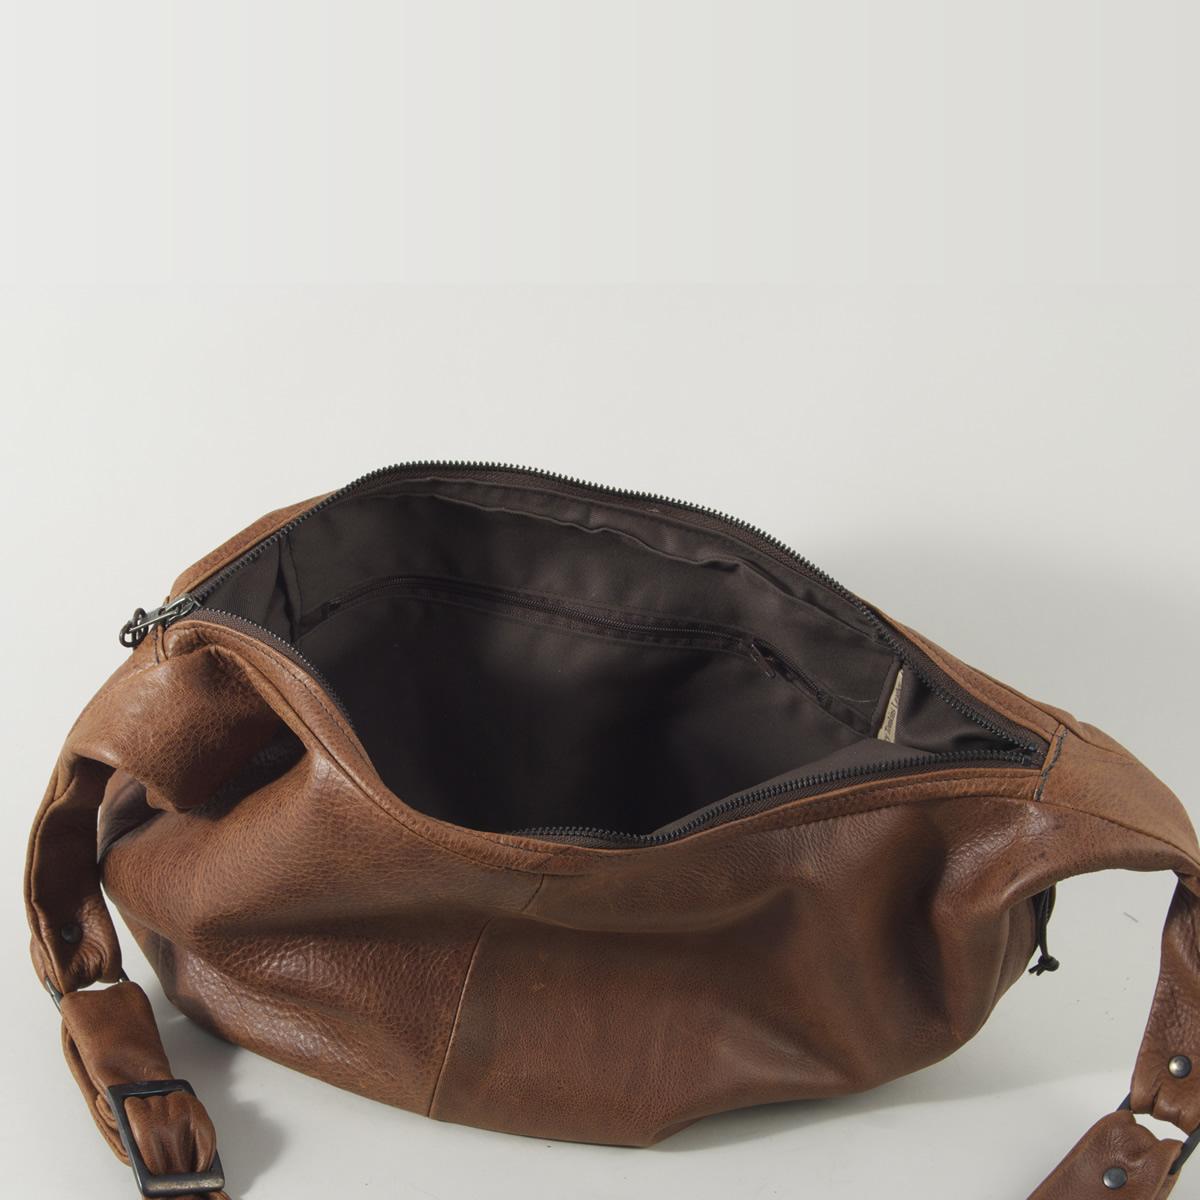 The Hammock Bag - Inside